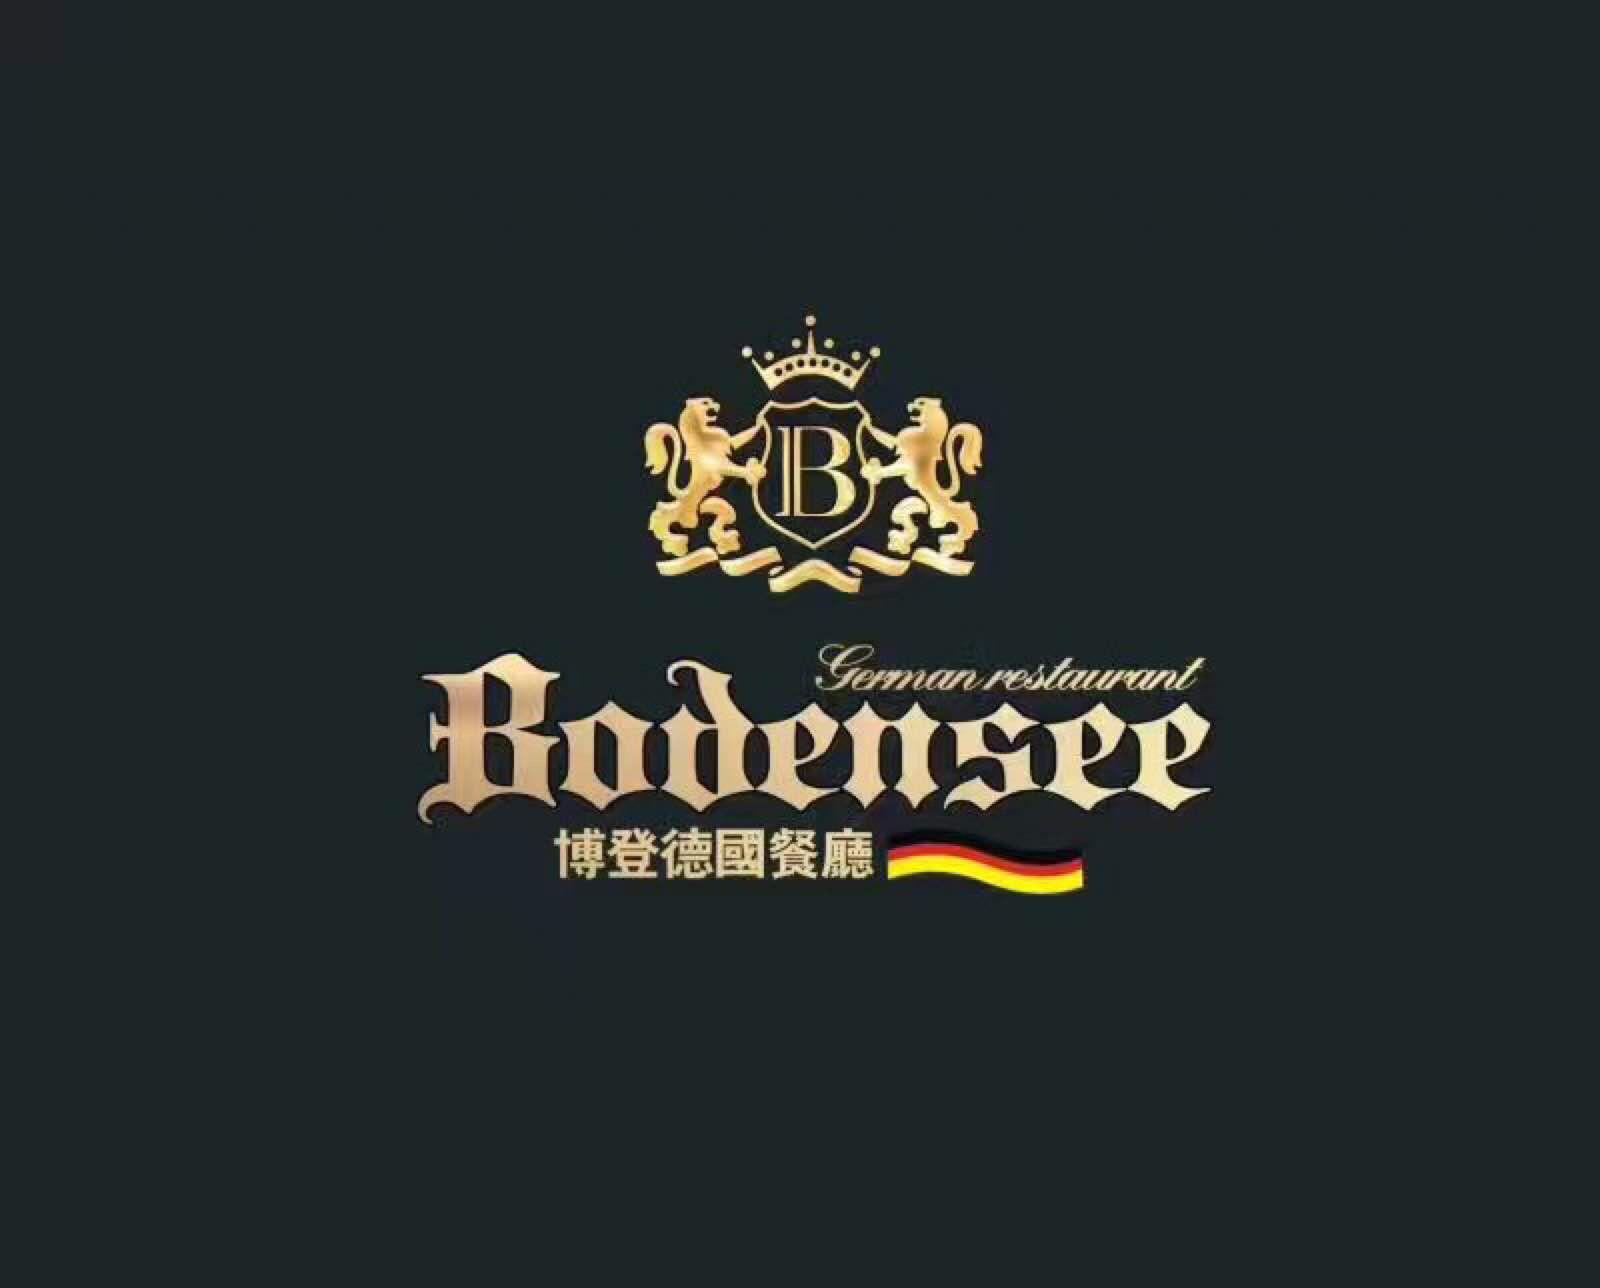 Bodensee-博登德国餐厅